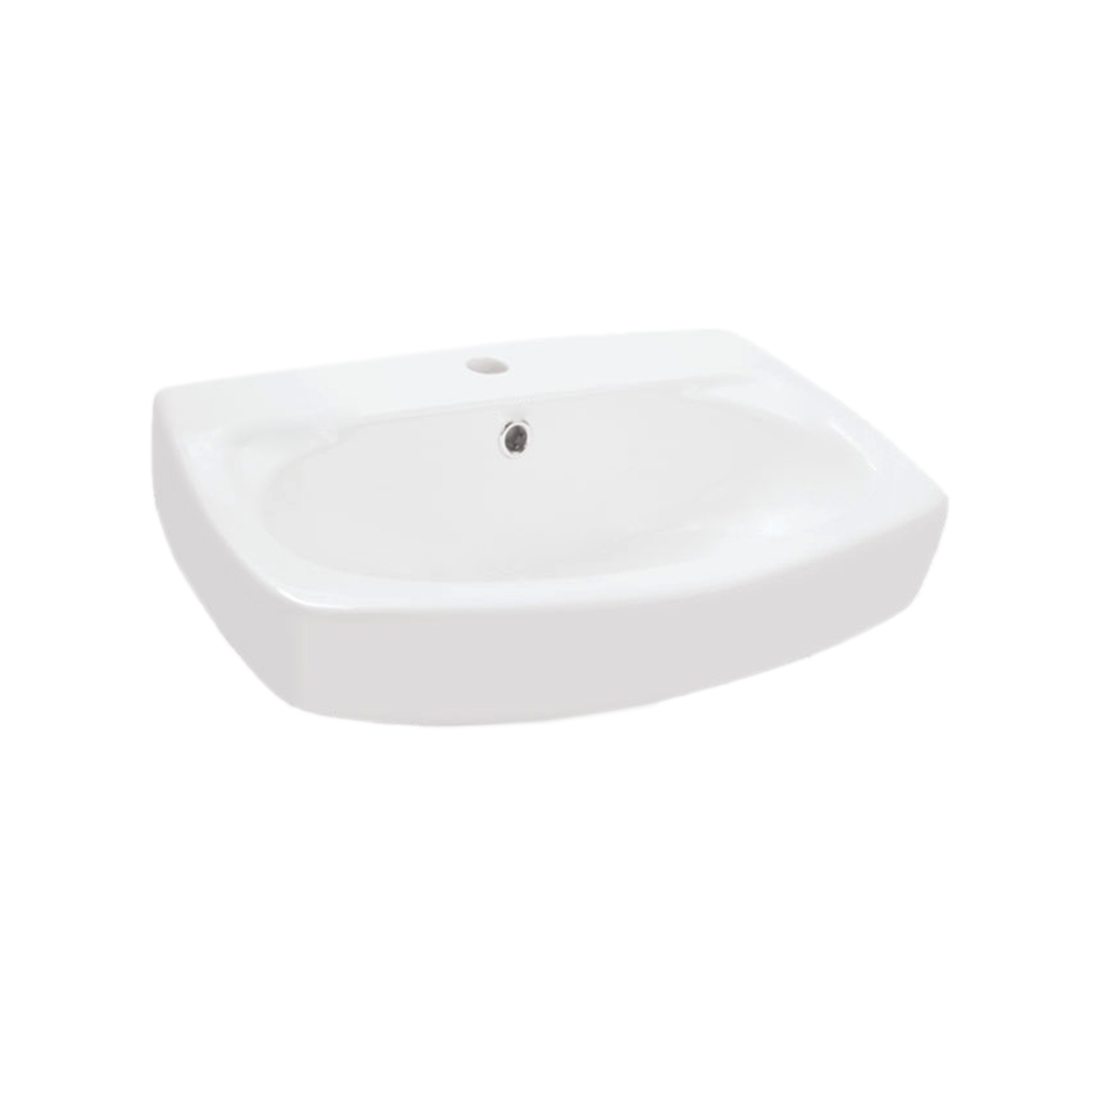 Kerovit Cassandra KS213 Wash Basin